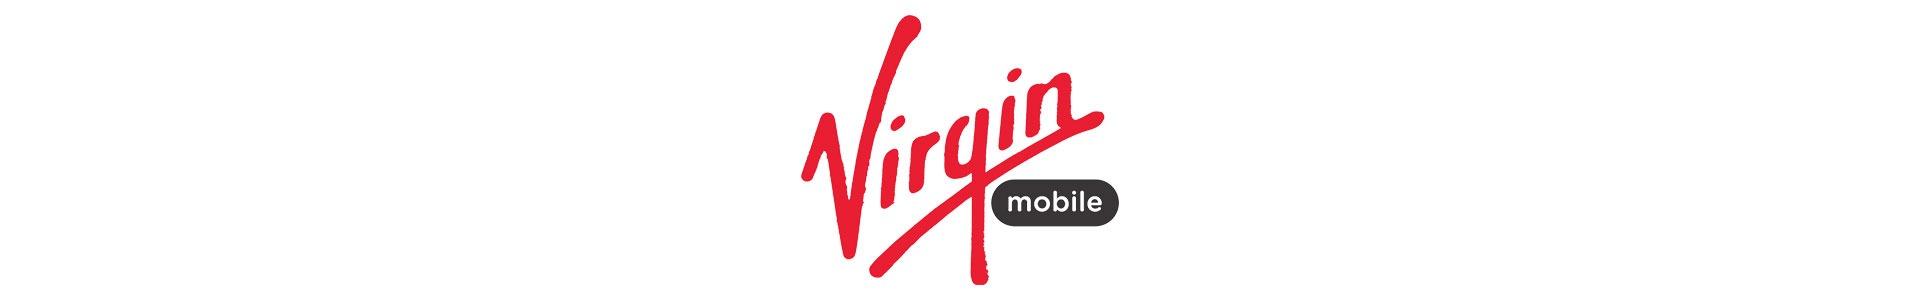 Virgin-banner